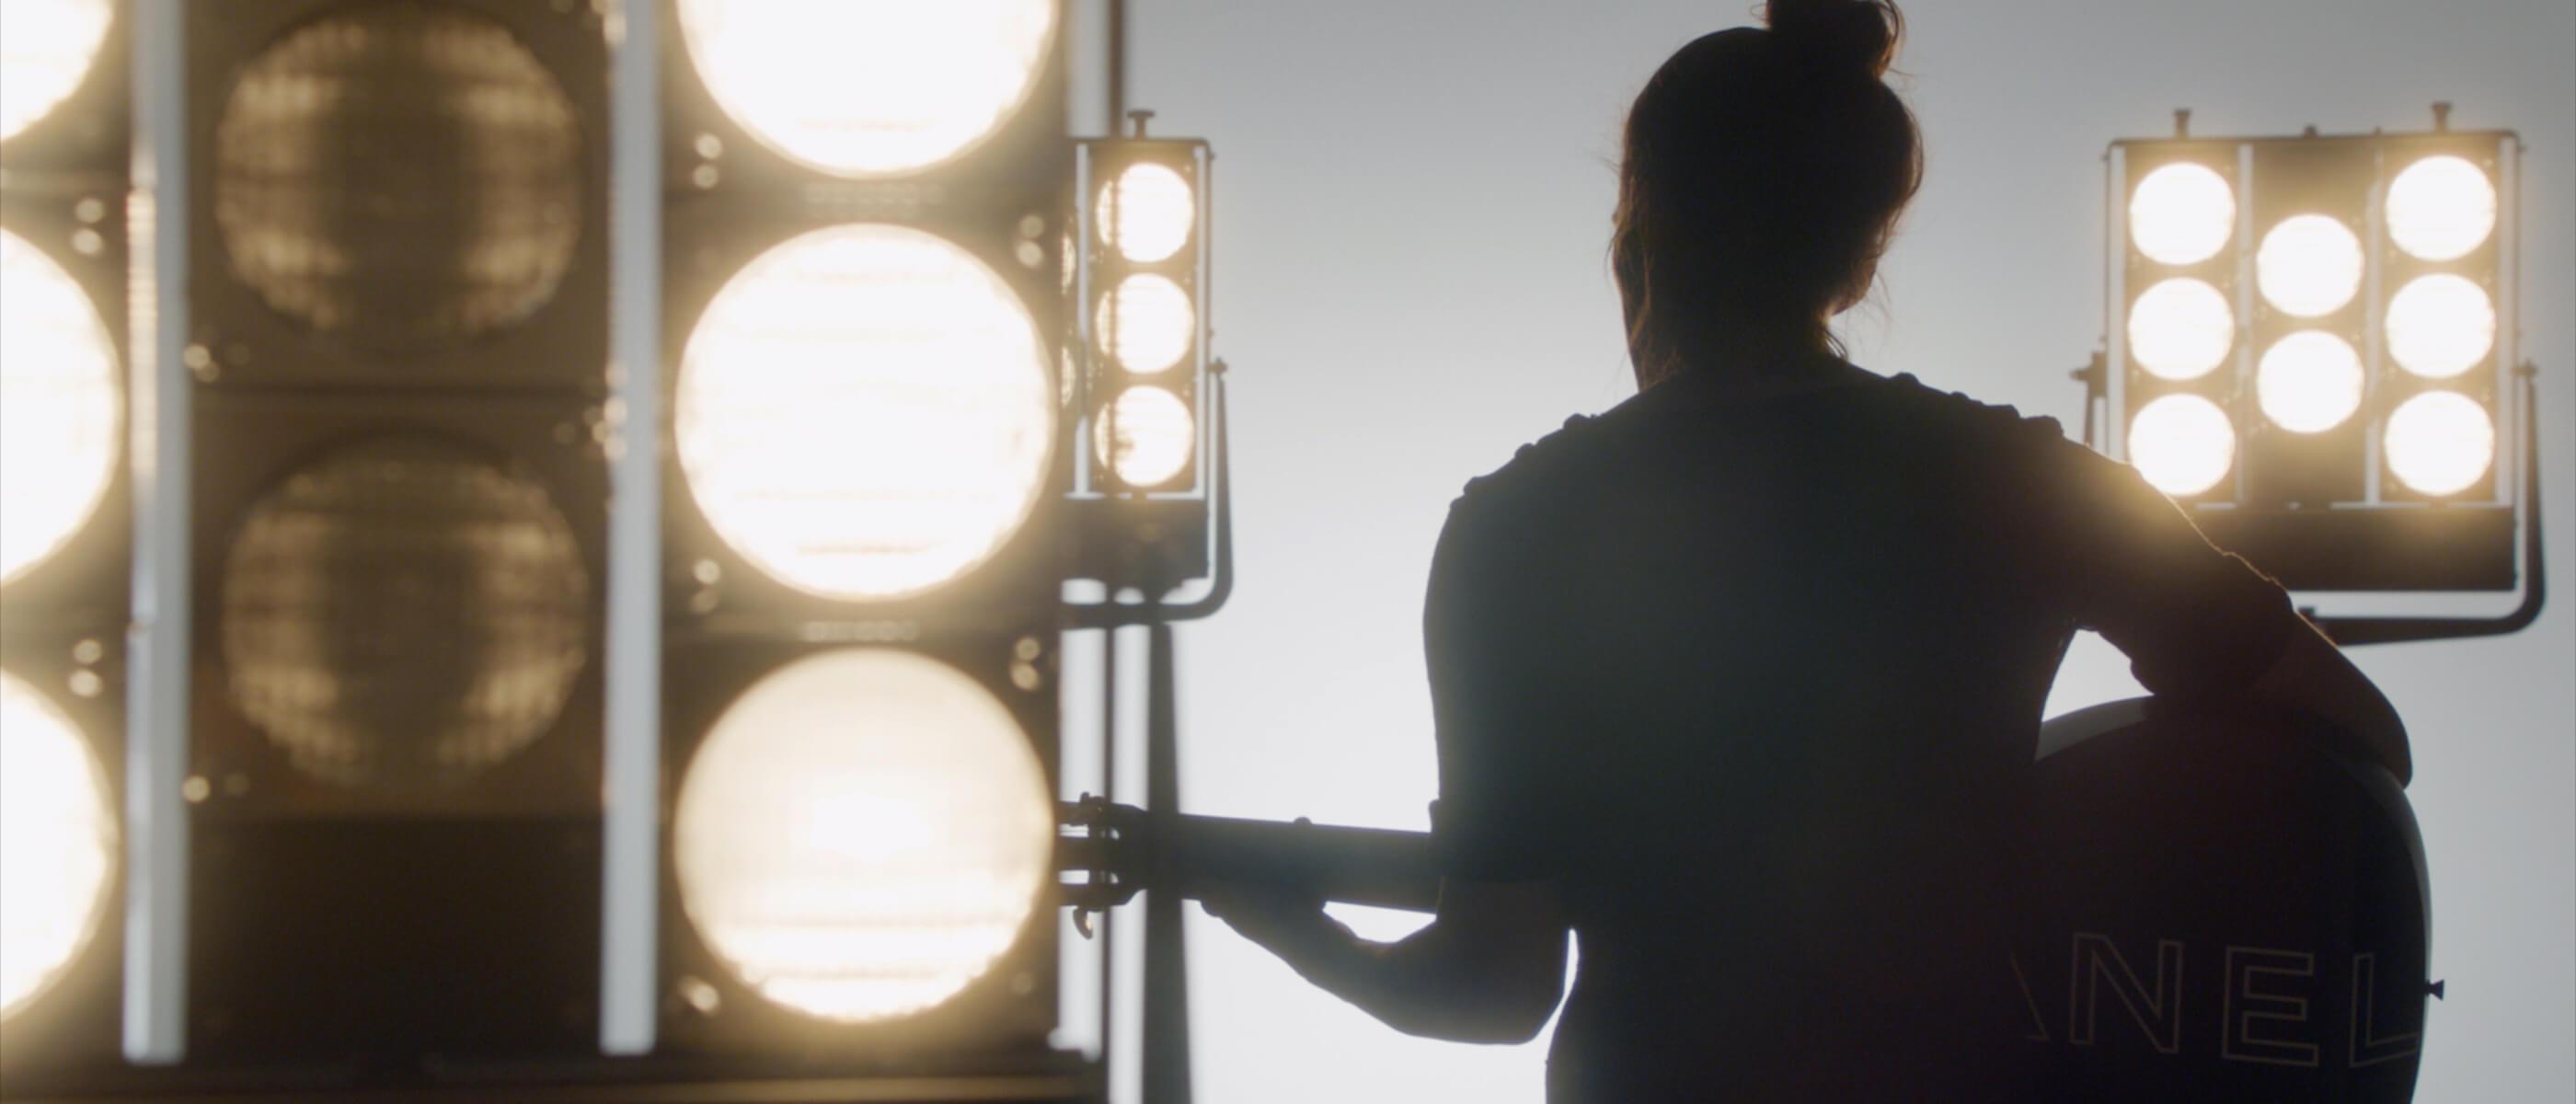 Кира Найтли спела в рекламном ролике Chanel-Фото 1